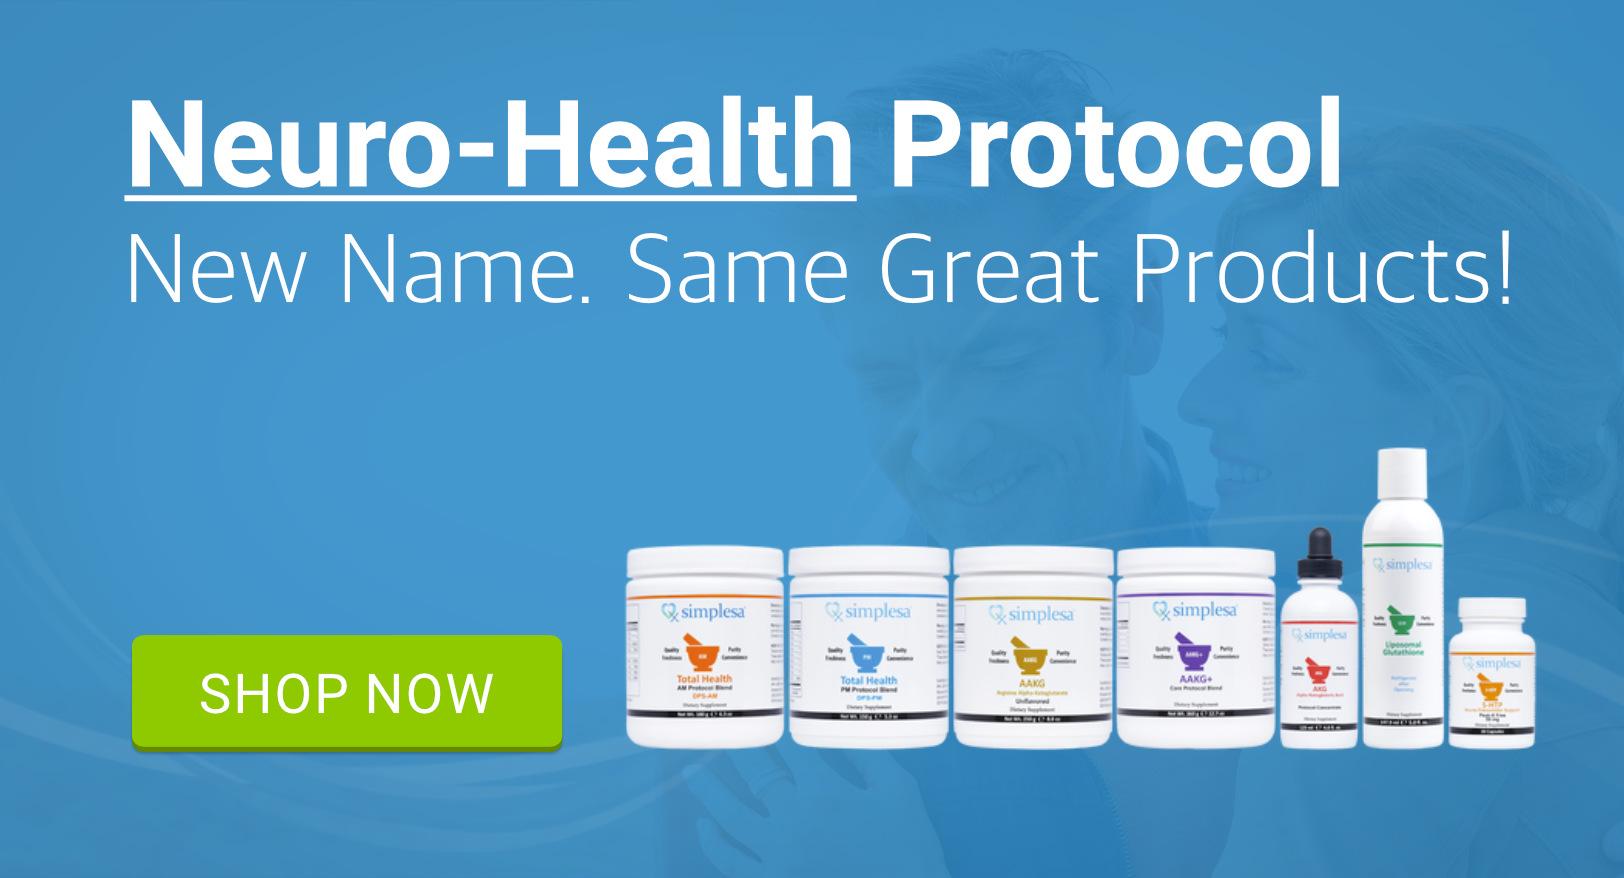 New Name - Neuro-Health Protocol